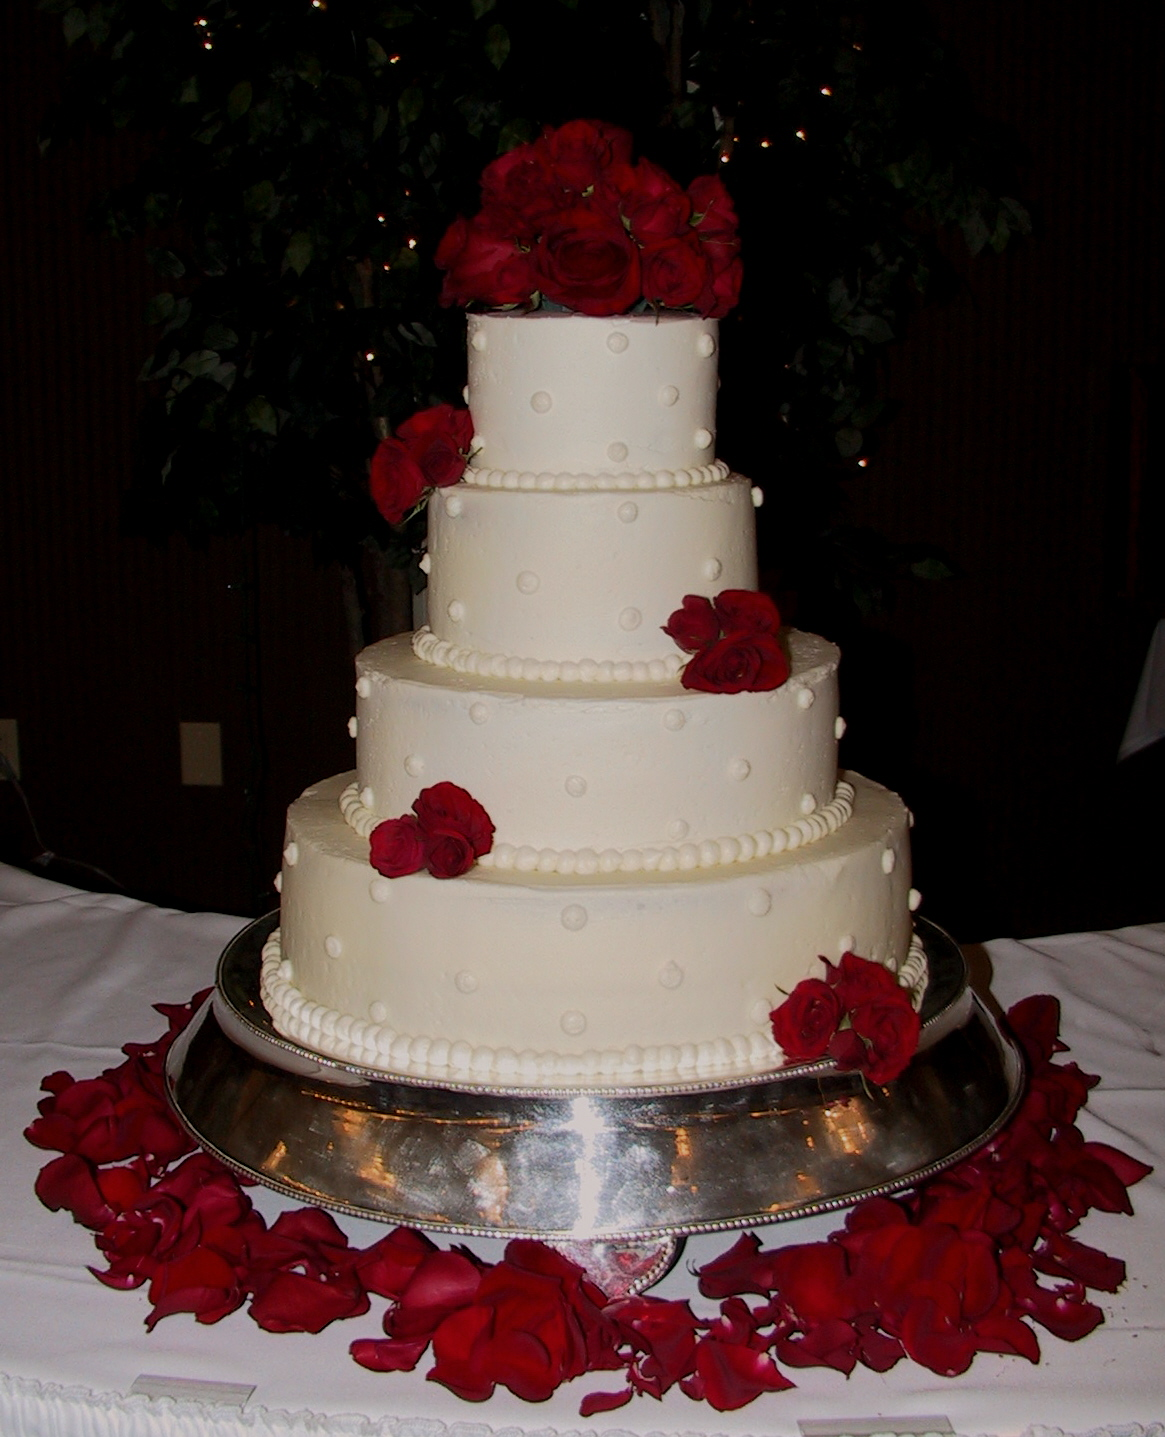 Rose Wedding Cake: White Wedding Cake With Fresh Red Roses Frankfort, KY